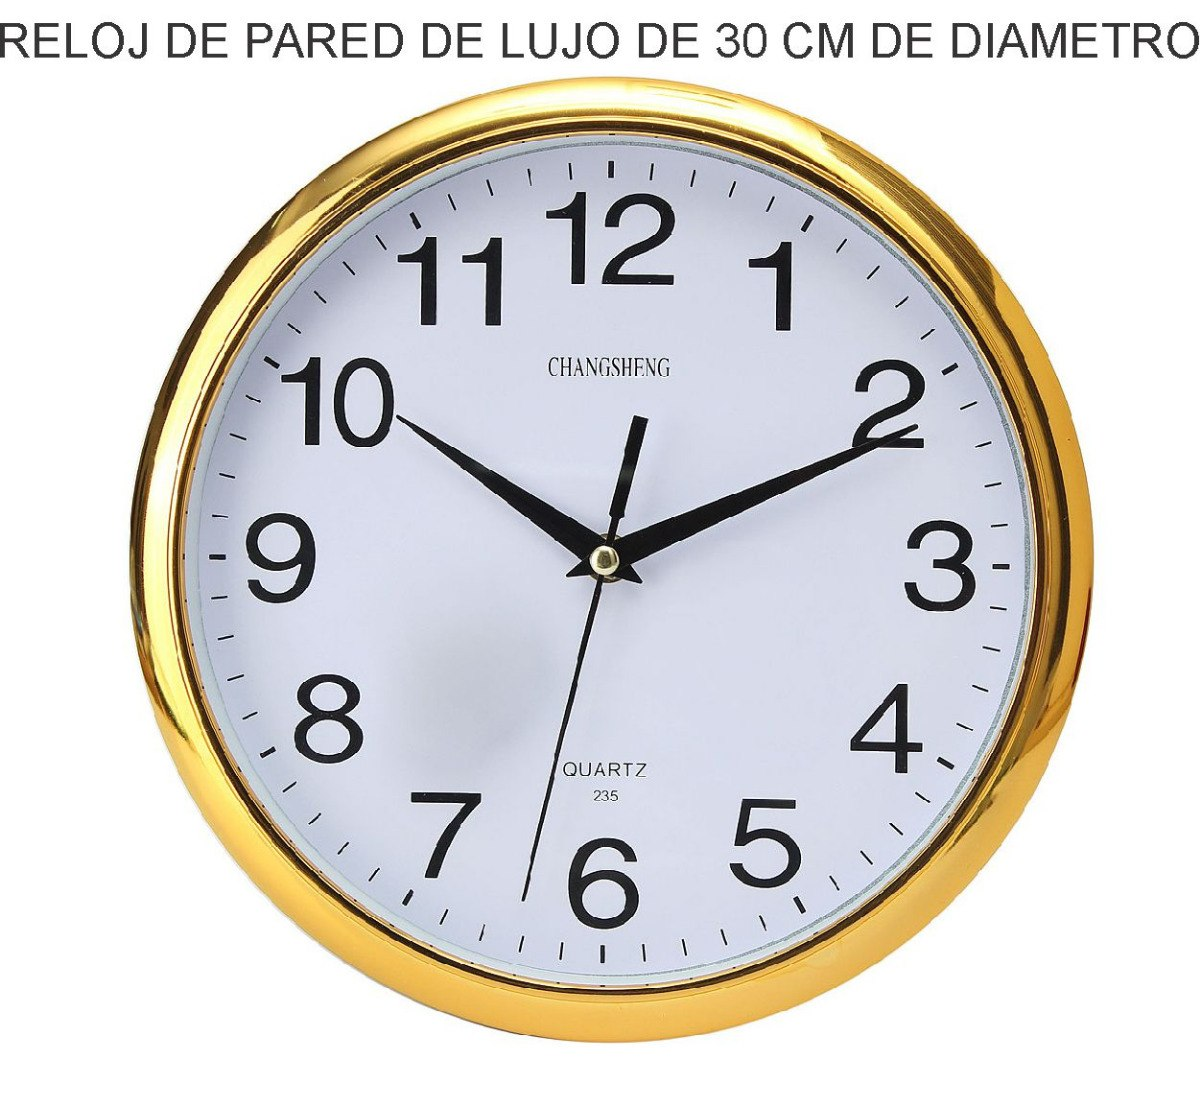 Reloj de pared de lujo cocina regalo empresa logo dorado pla bs en mercado libre - Reloj de pared para cocina ...